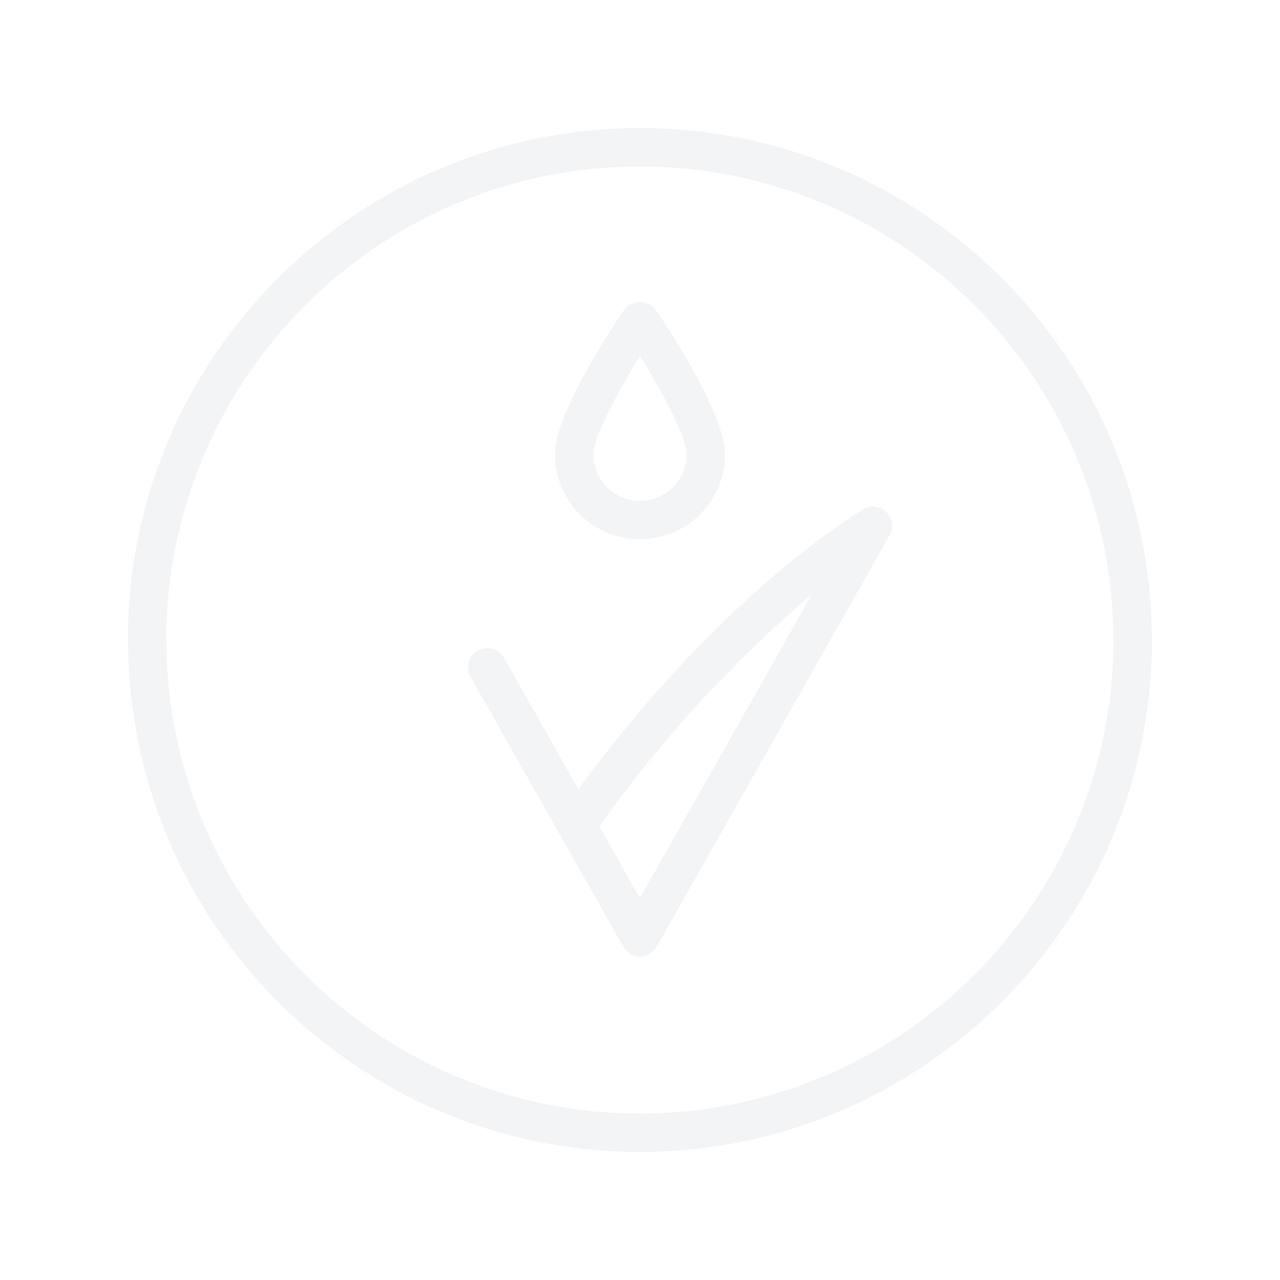 GIORGIO ARMANI Smooth Silk Eye Pencil 1.05g